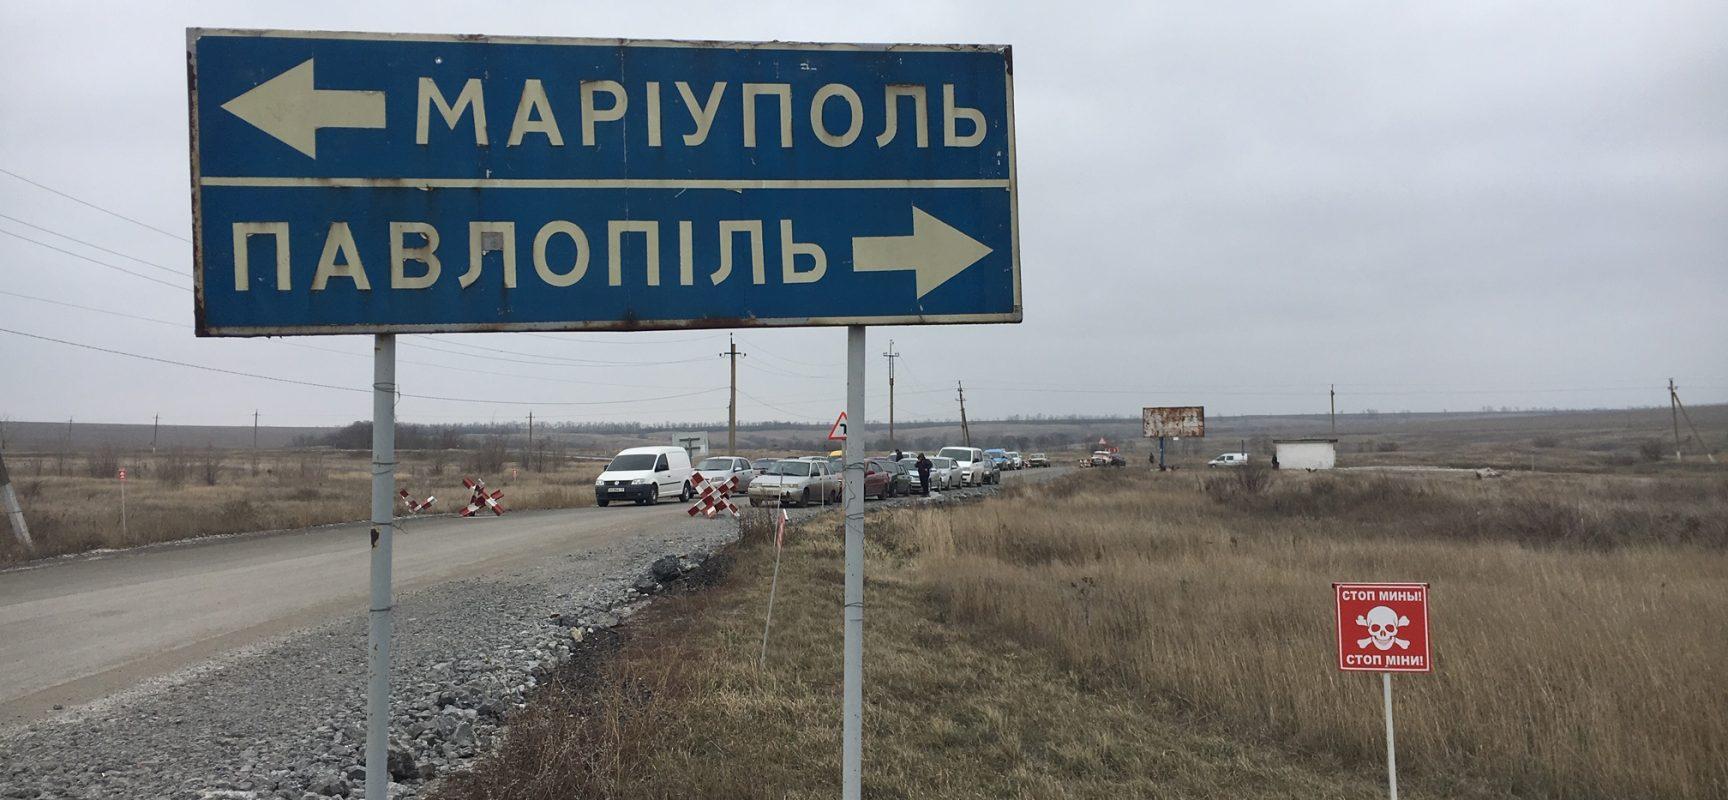 Mariupol ed una inattesa normalità